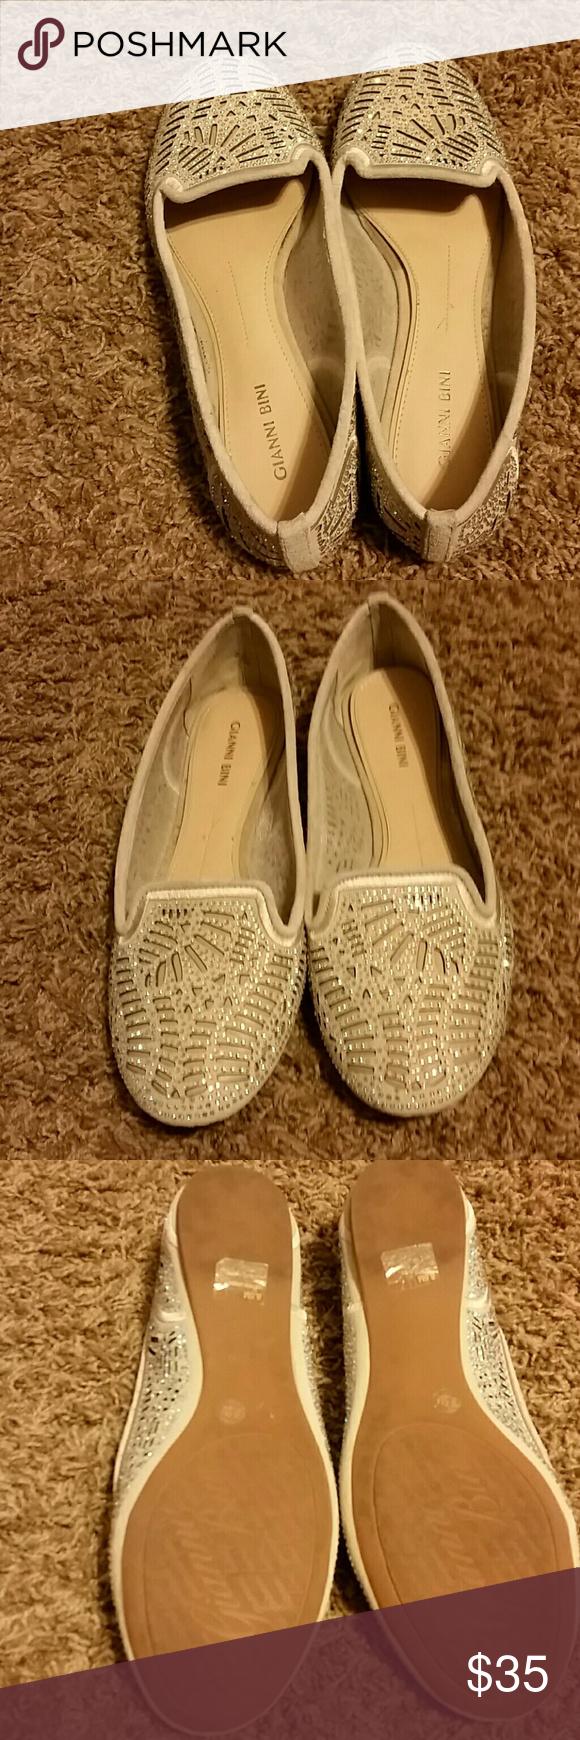 Gianni Bini 8.5 shoes Soon cute! Gianni Bini flats with jewels only worn once! Gianni Bini Shoes Flats & Loafers